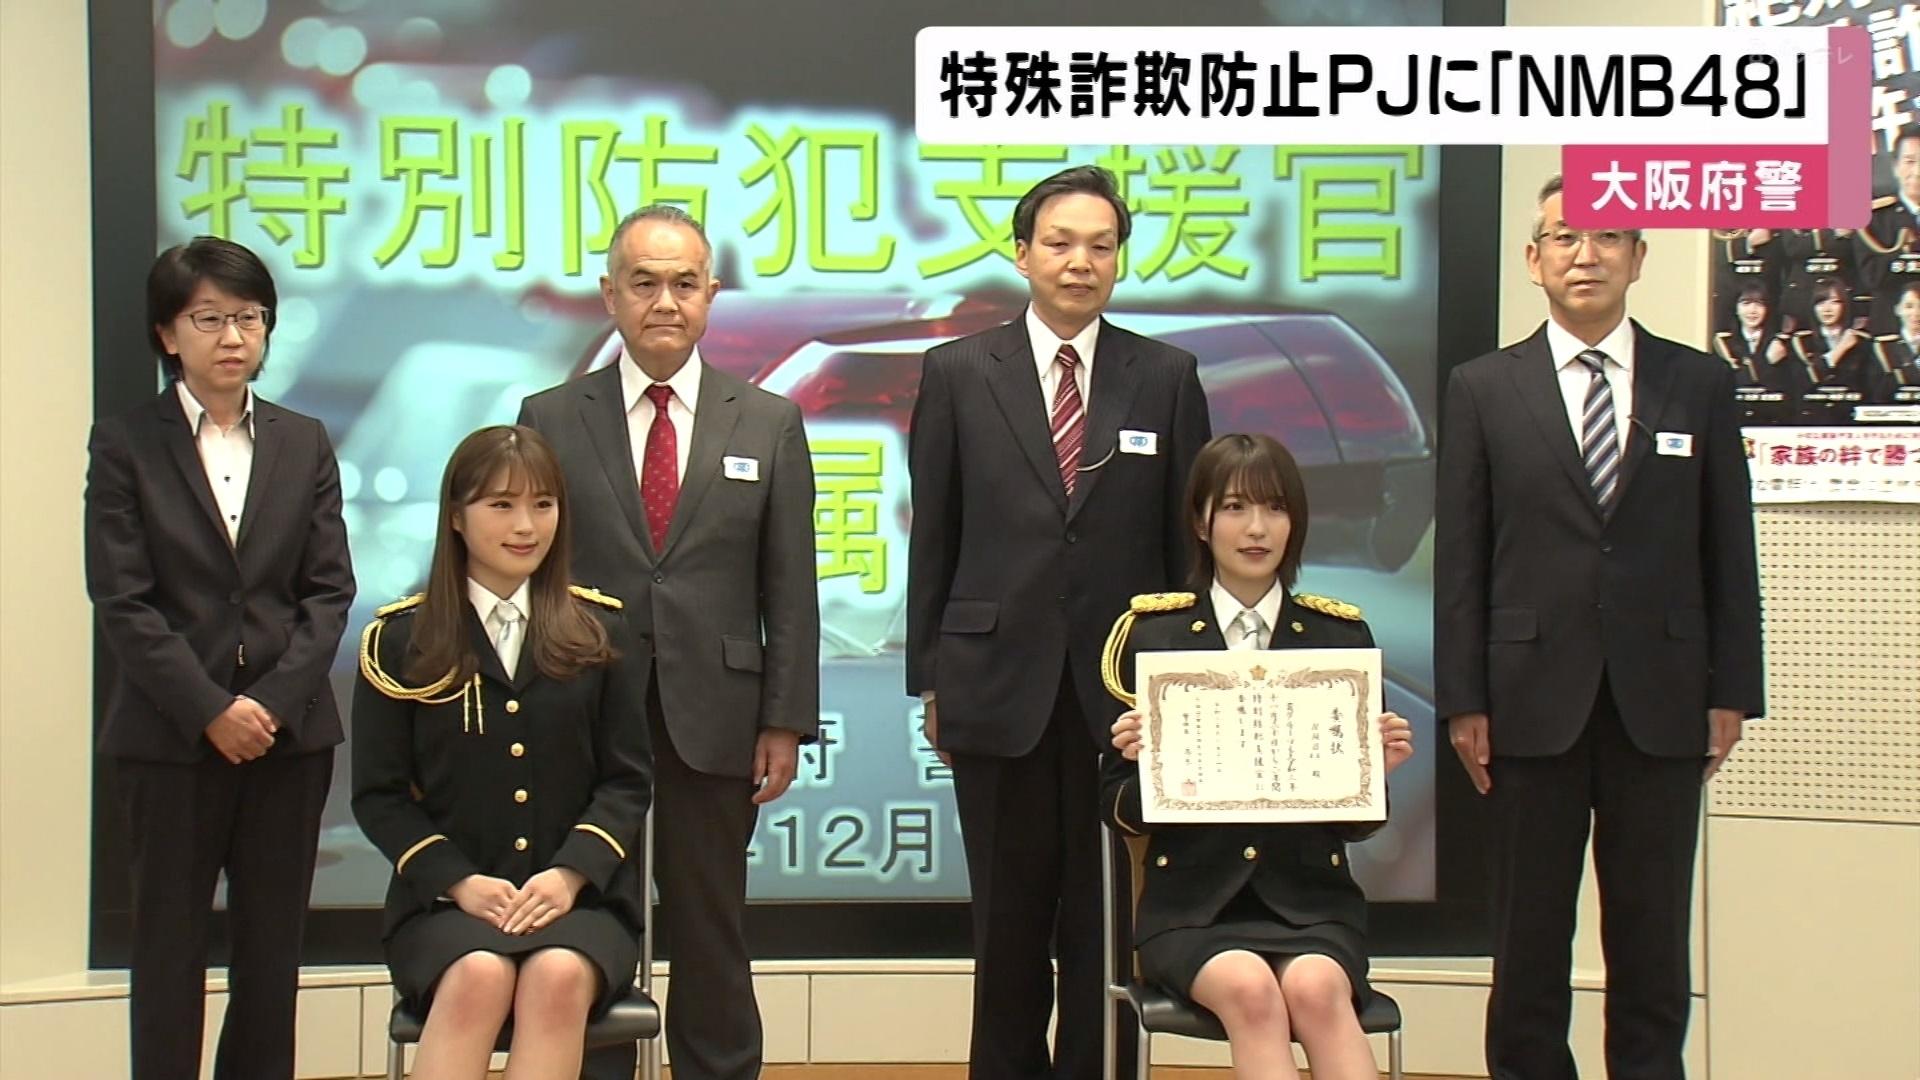 【NMB48】特殊詐欺予防プロジェクトチーム「ストップ・オレオレ詐欺47~家族の絆作戦~」の「特別防犯支援官」の一員にNMB48が就任